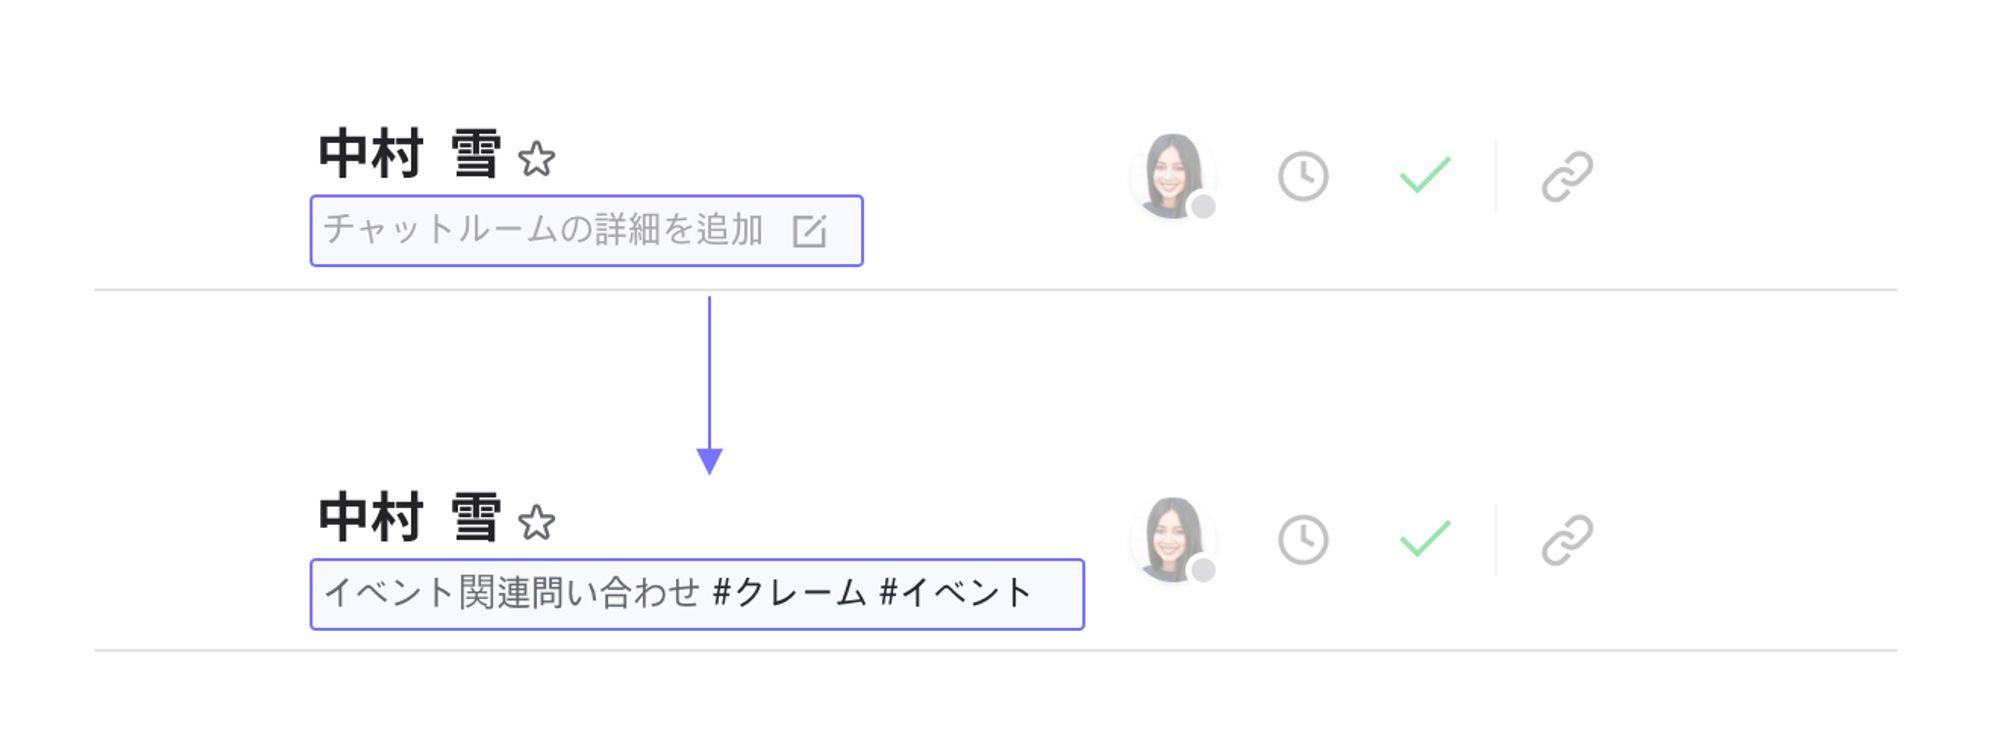 new-userchat-5-ja.jpg